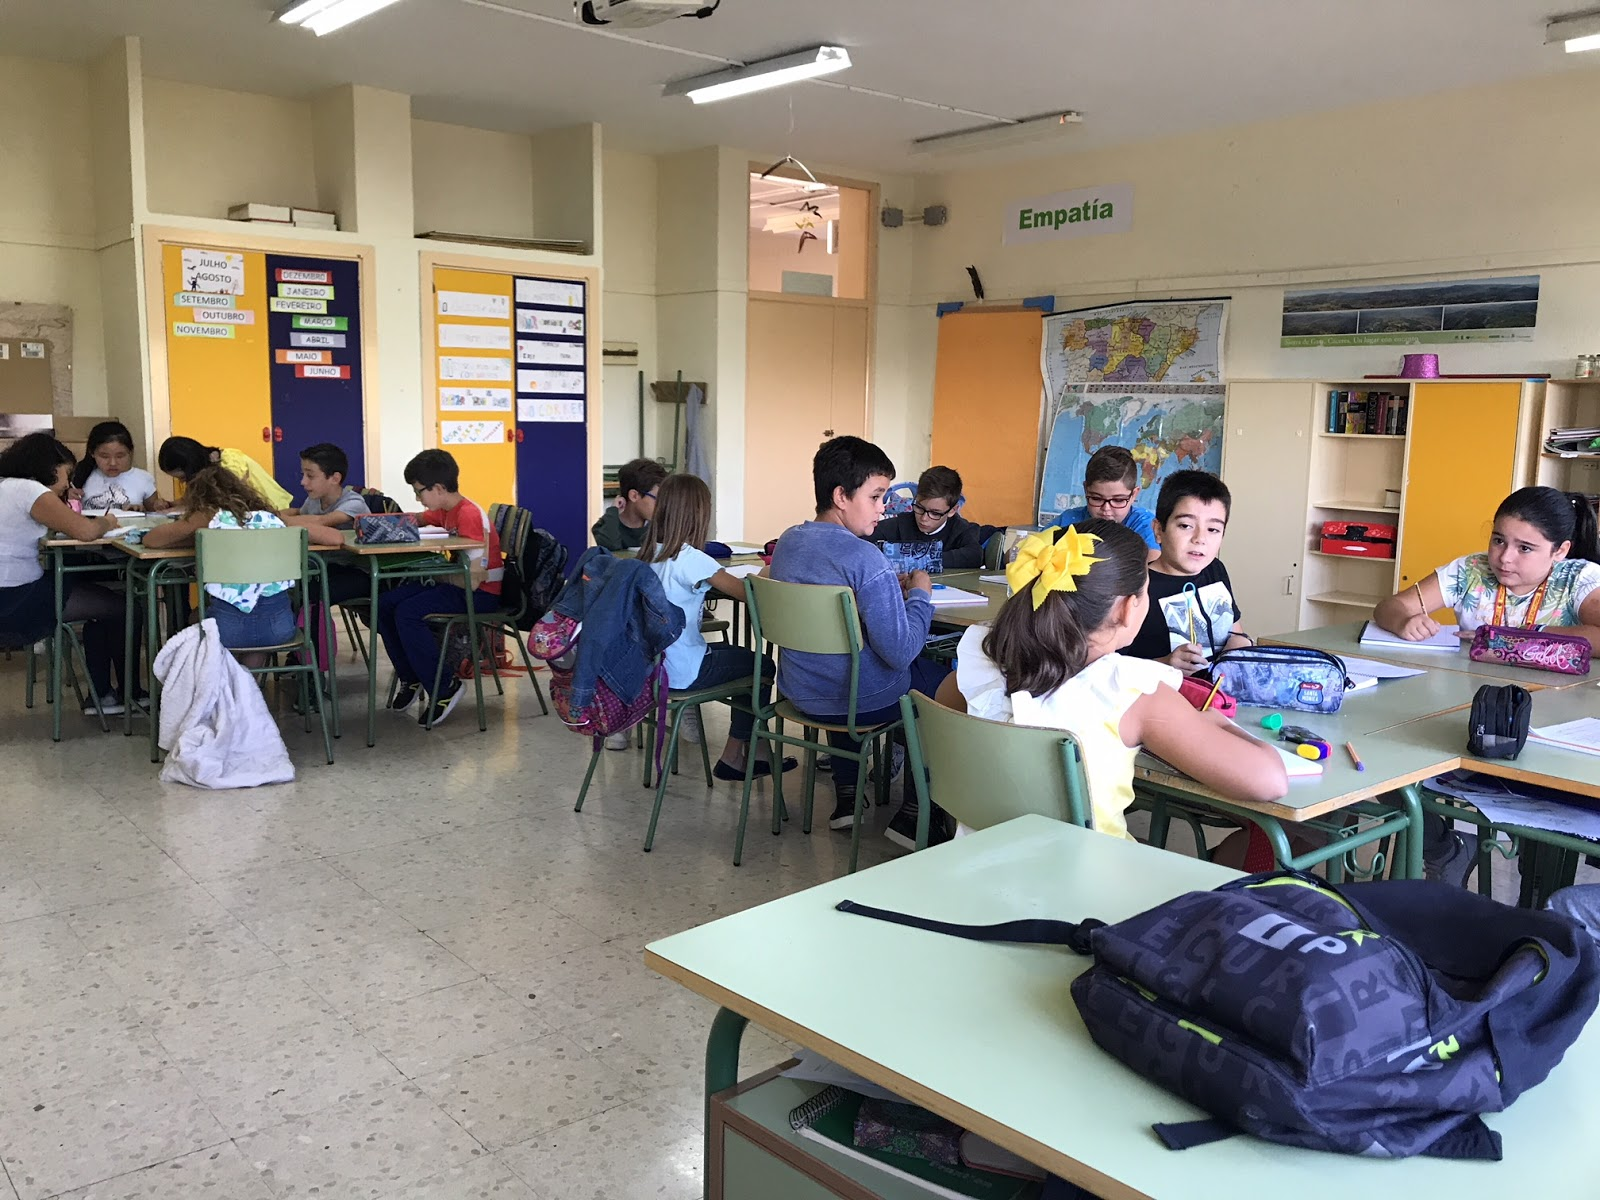 Room Scape En Ourense